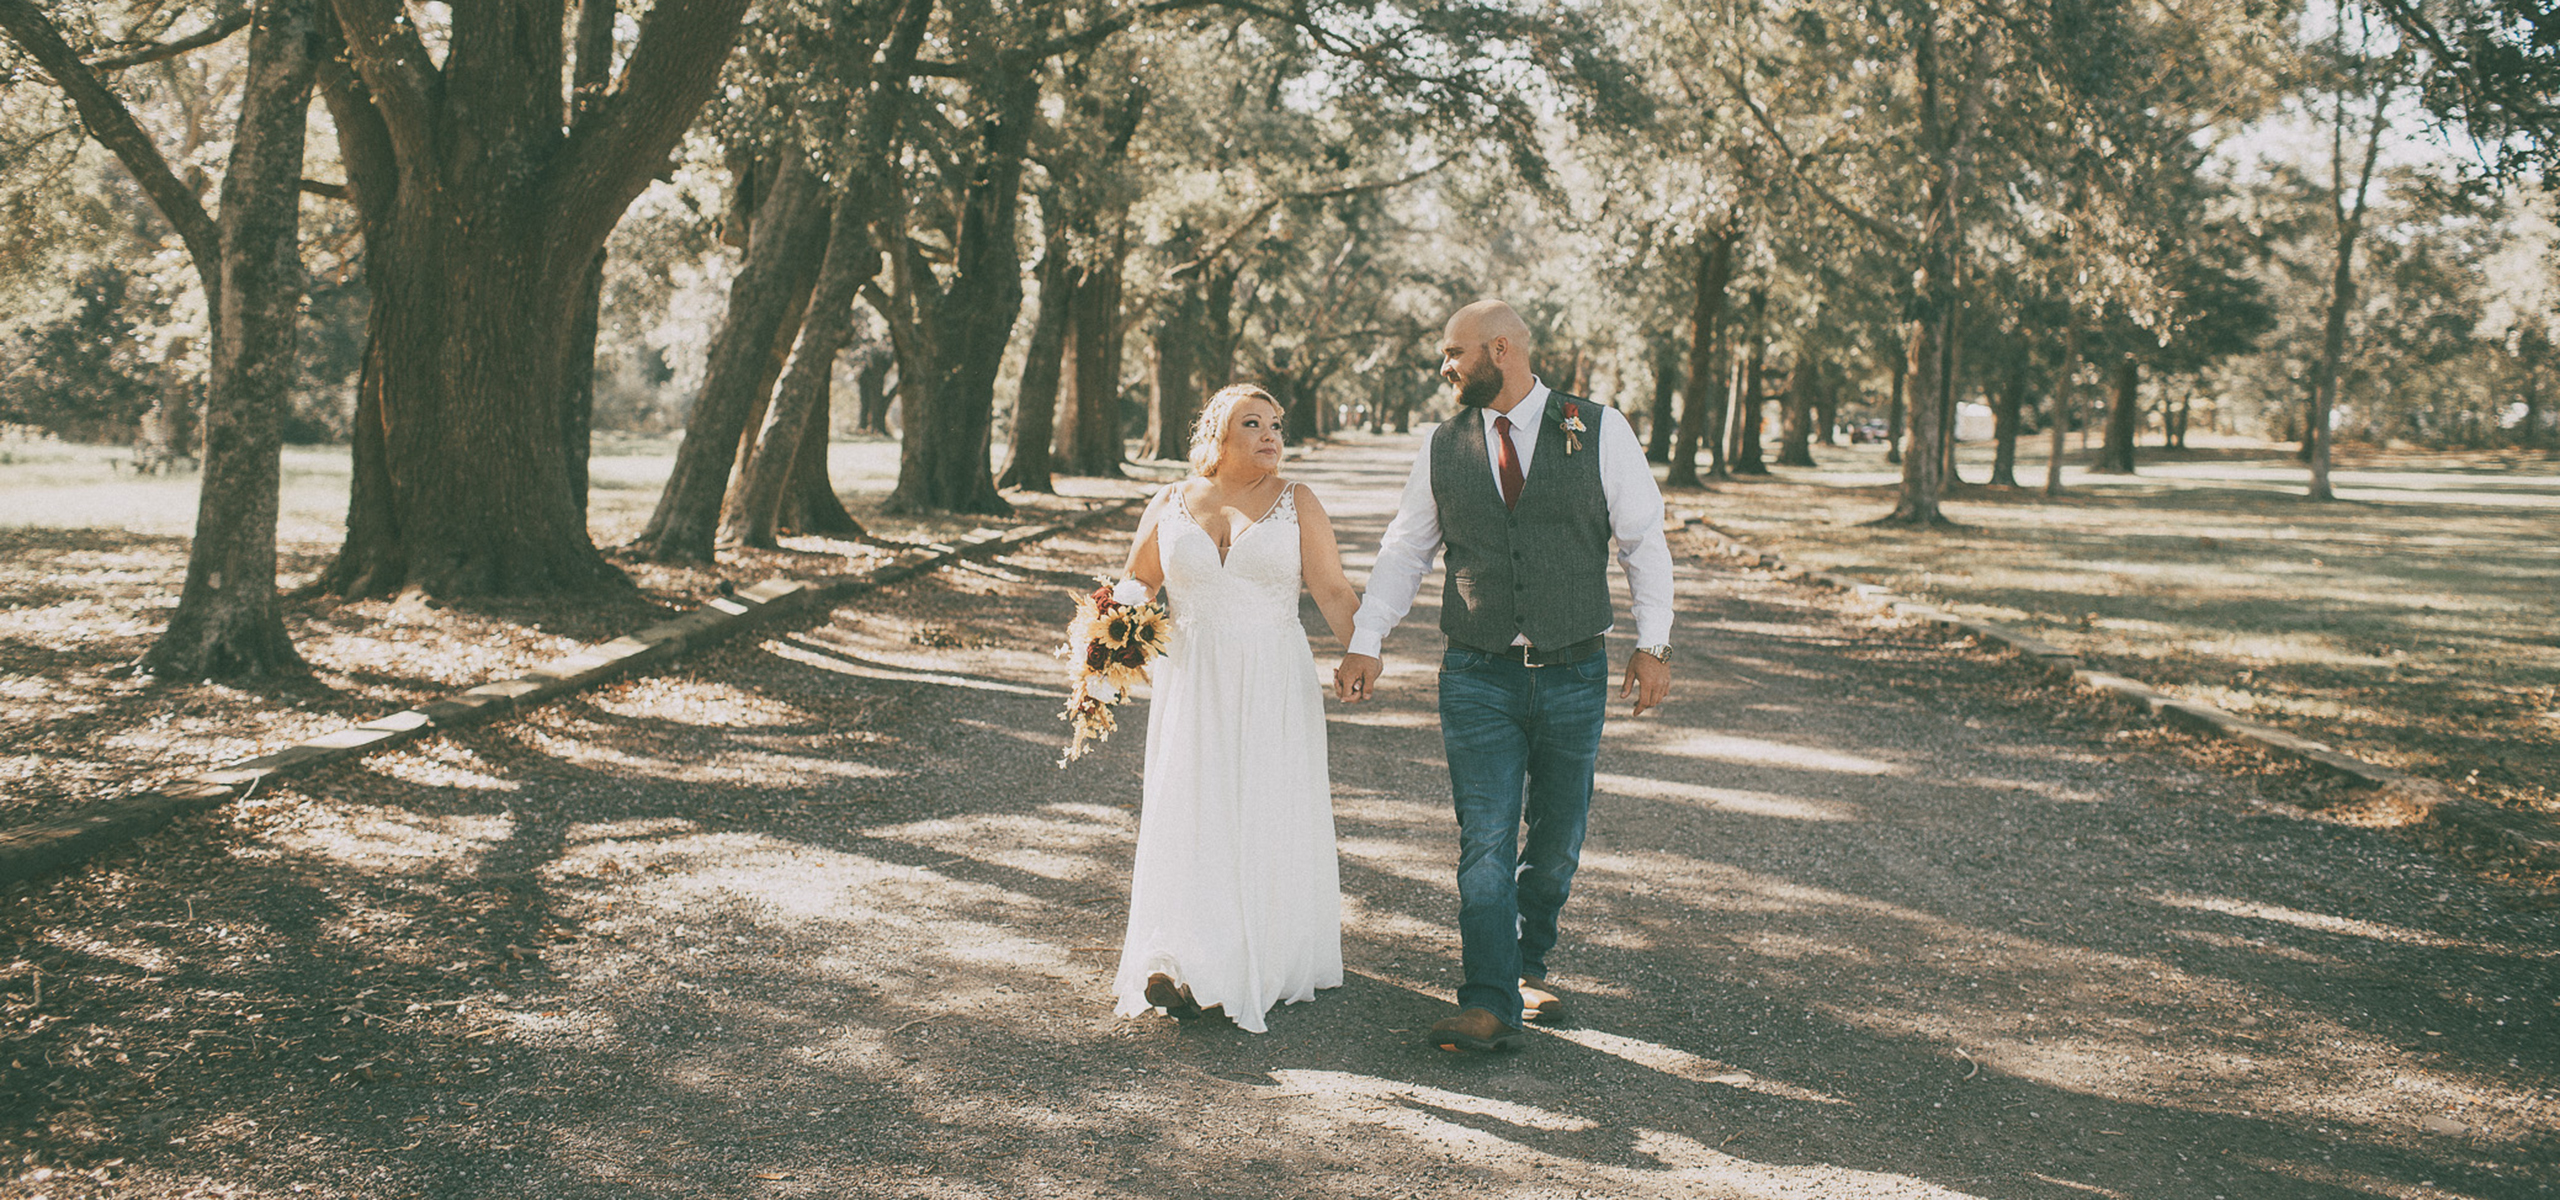 Ogden Utah Wedding Photography + Elopement Photography